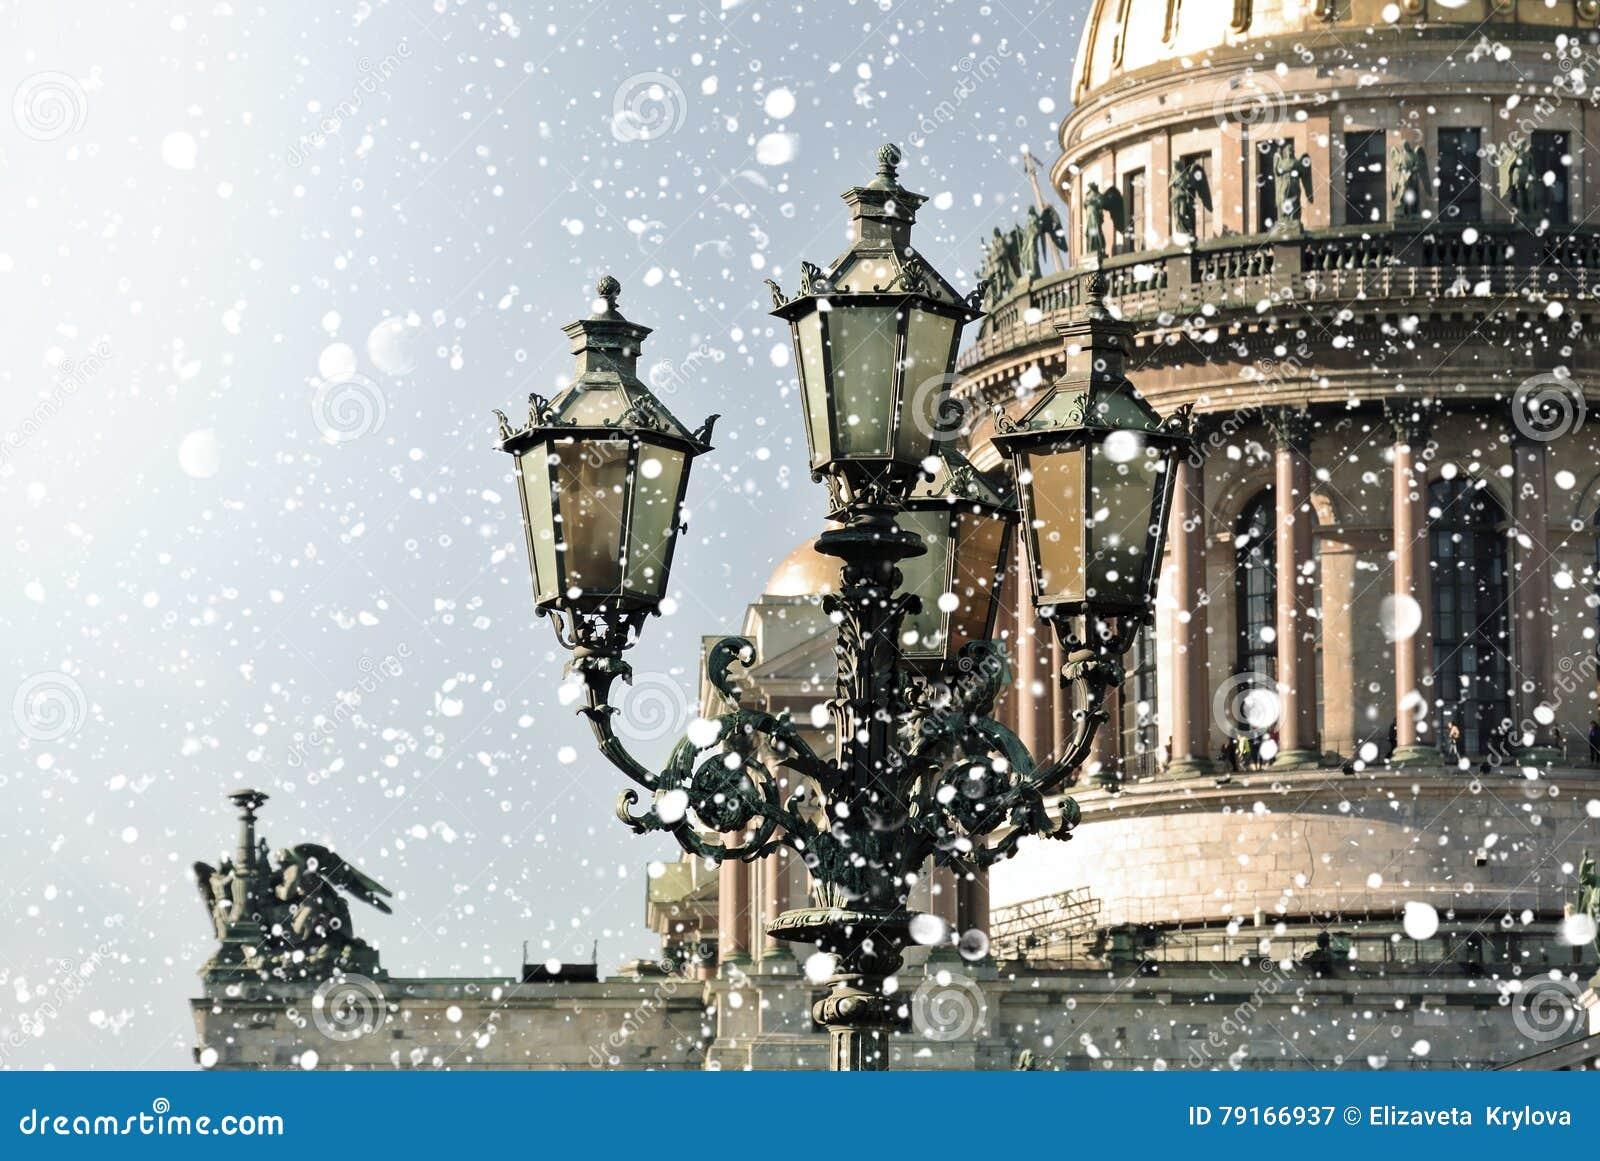 Inverno in San Pietroburgo San Isaac Cathedral nella bufera di neve, St Petersburg, Russia